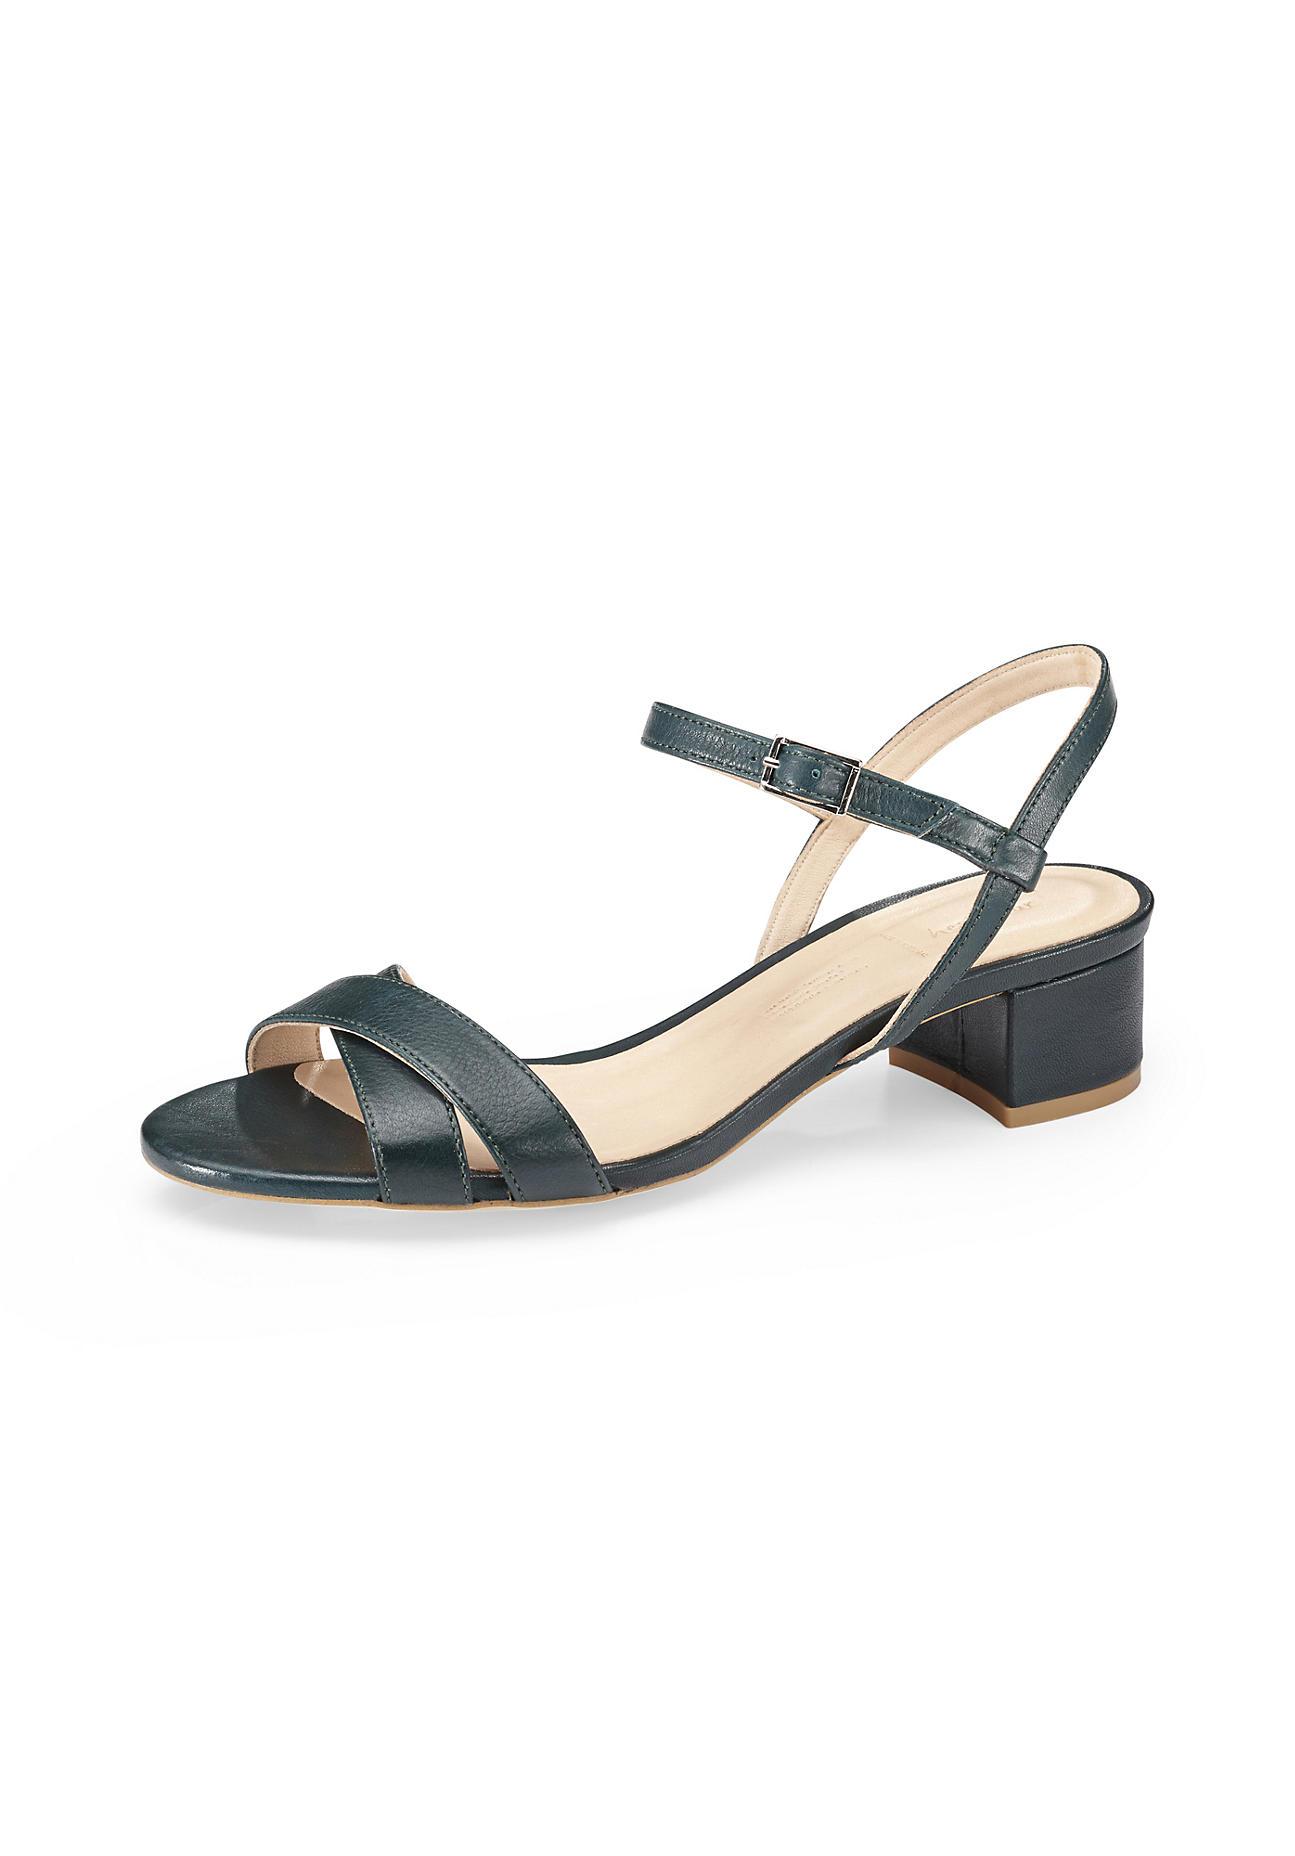 hessnatur Damen Damen Sandalette aus Leder – grün – Größe 39